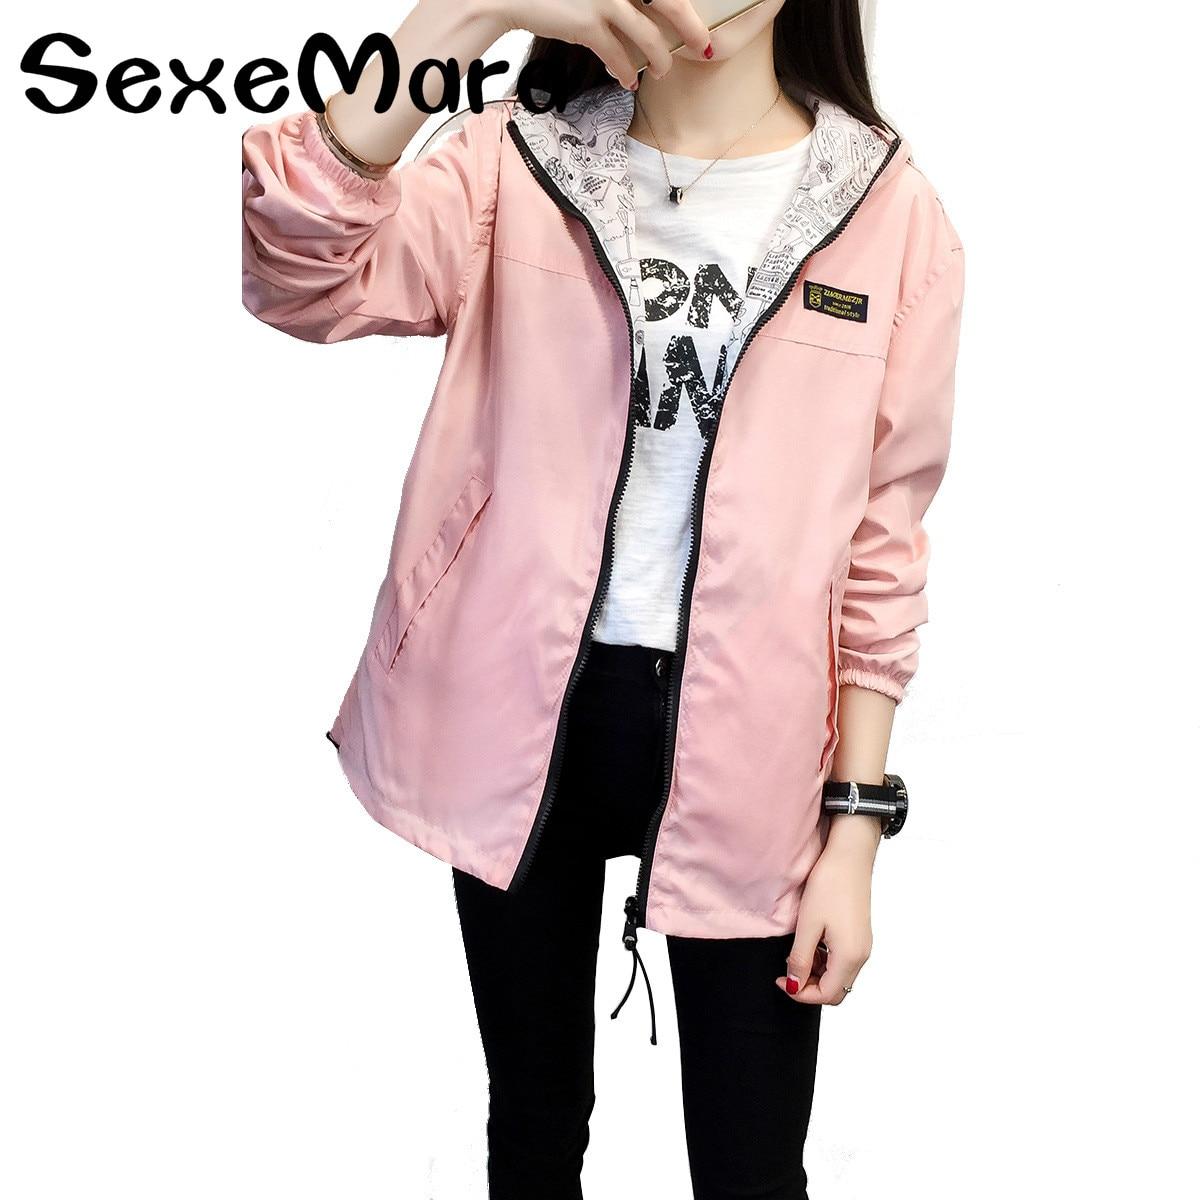 2018 Autumn Women Bomber   Basic     Jacket   Pocket Zipper Hooded Two Side Wear Cartoon Print Outwear Loose Long Sleeves Feminino Coats